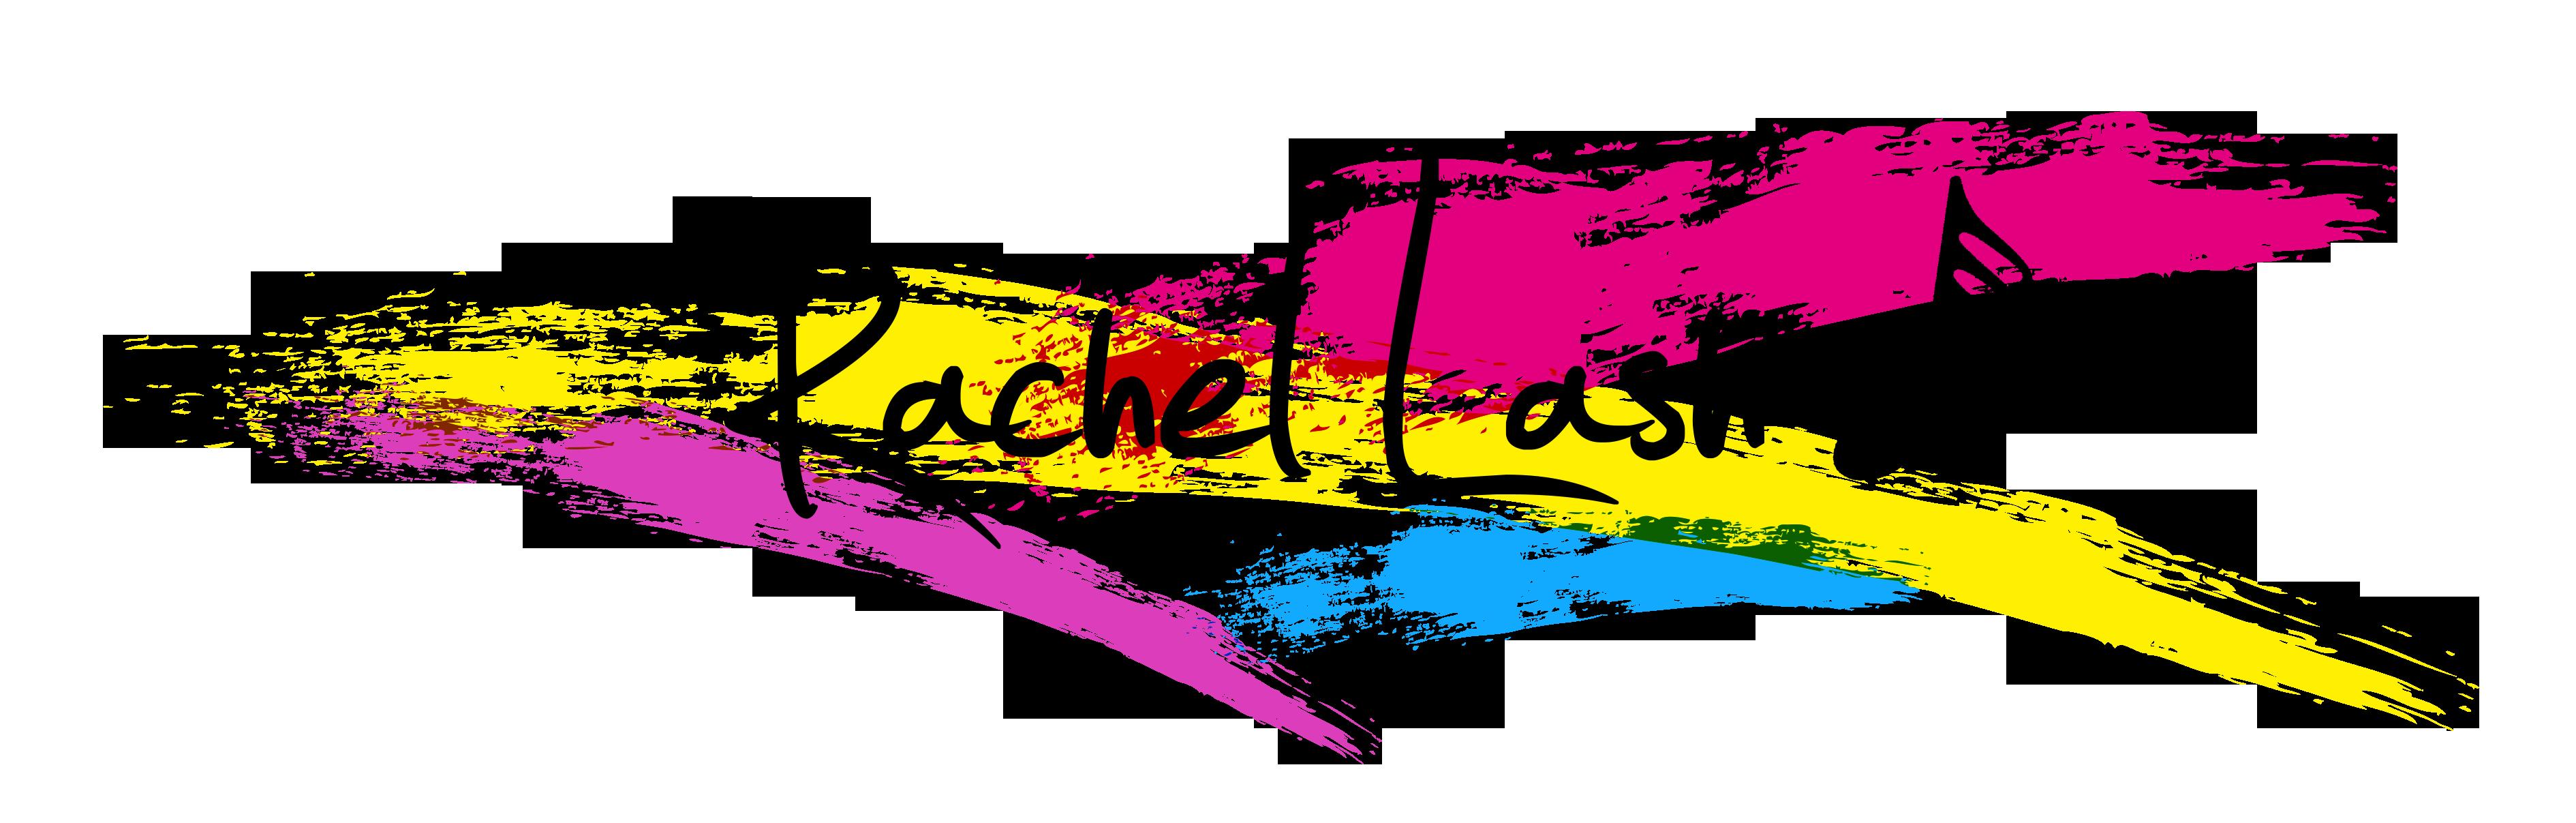 Rachel Lash by CHELCO